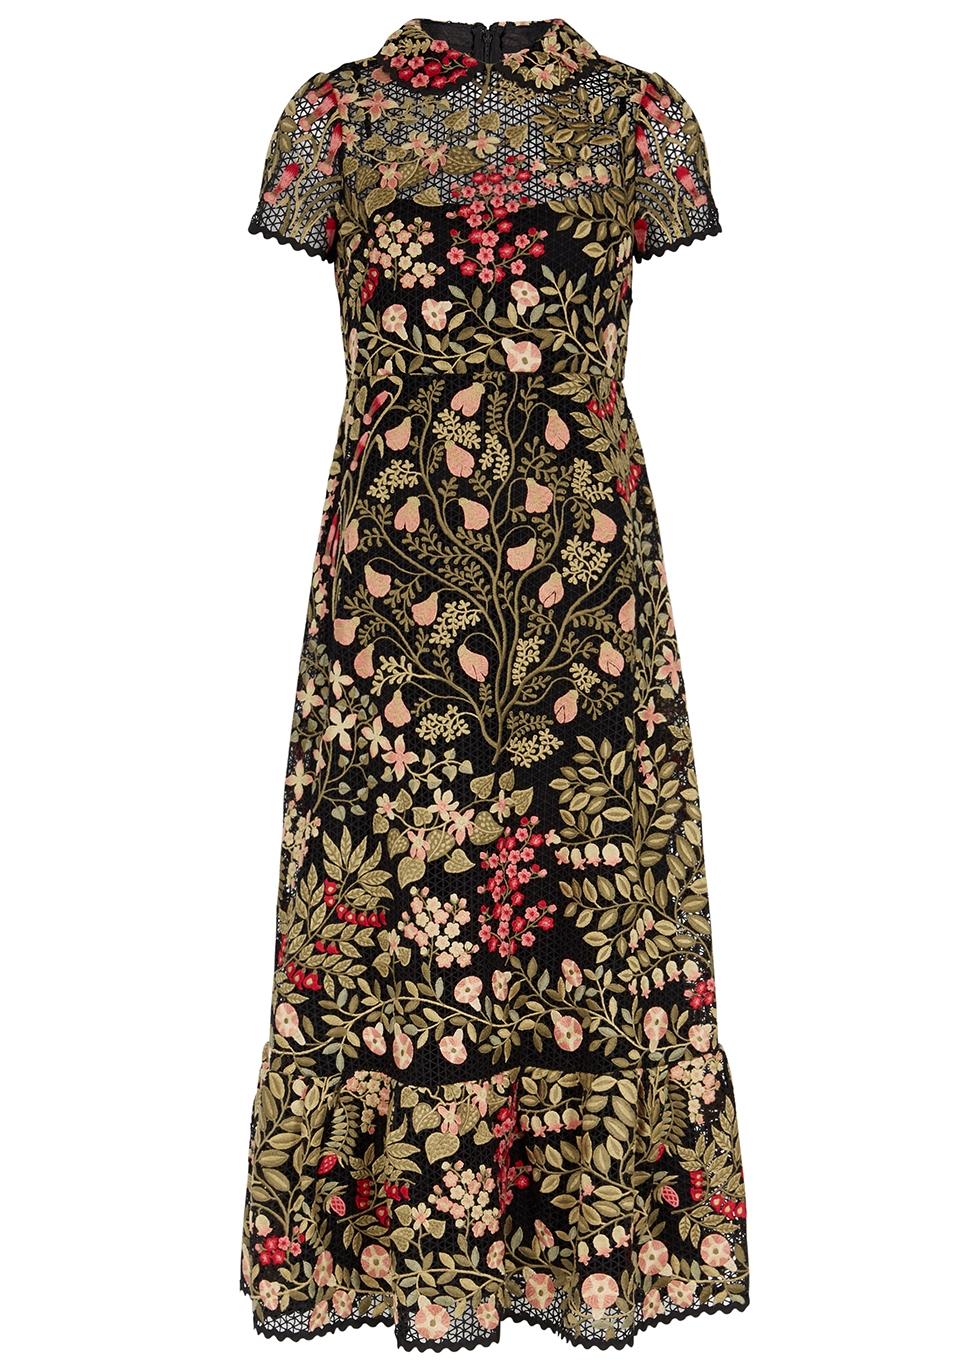 c5bb7932e6db Wedding Guest Dresses & Outfits - Wedding Shop - Harvey Nichols